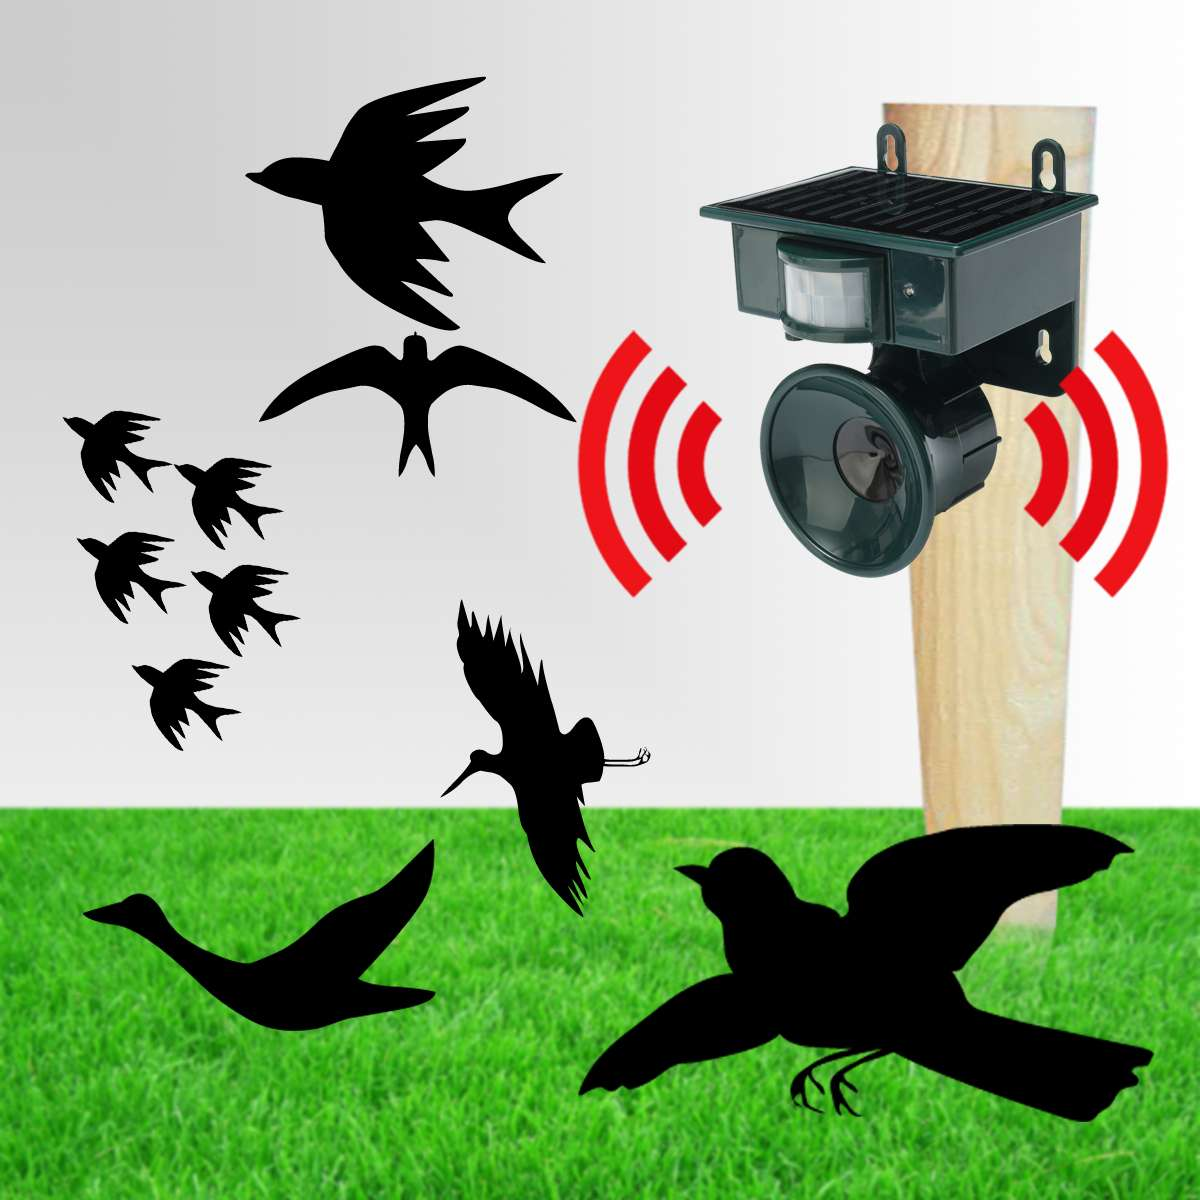 Solar Powered Ultrasonic Bird Repeller PIR Motion Sensor Animal Repellent Bird Pest for Home and Garden Protection-in Repellents from Home & Garden